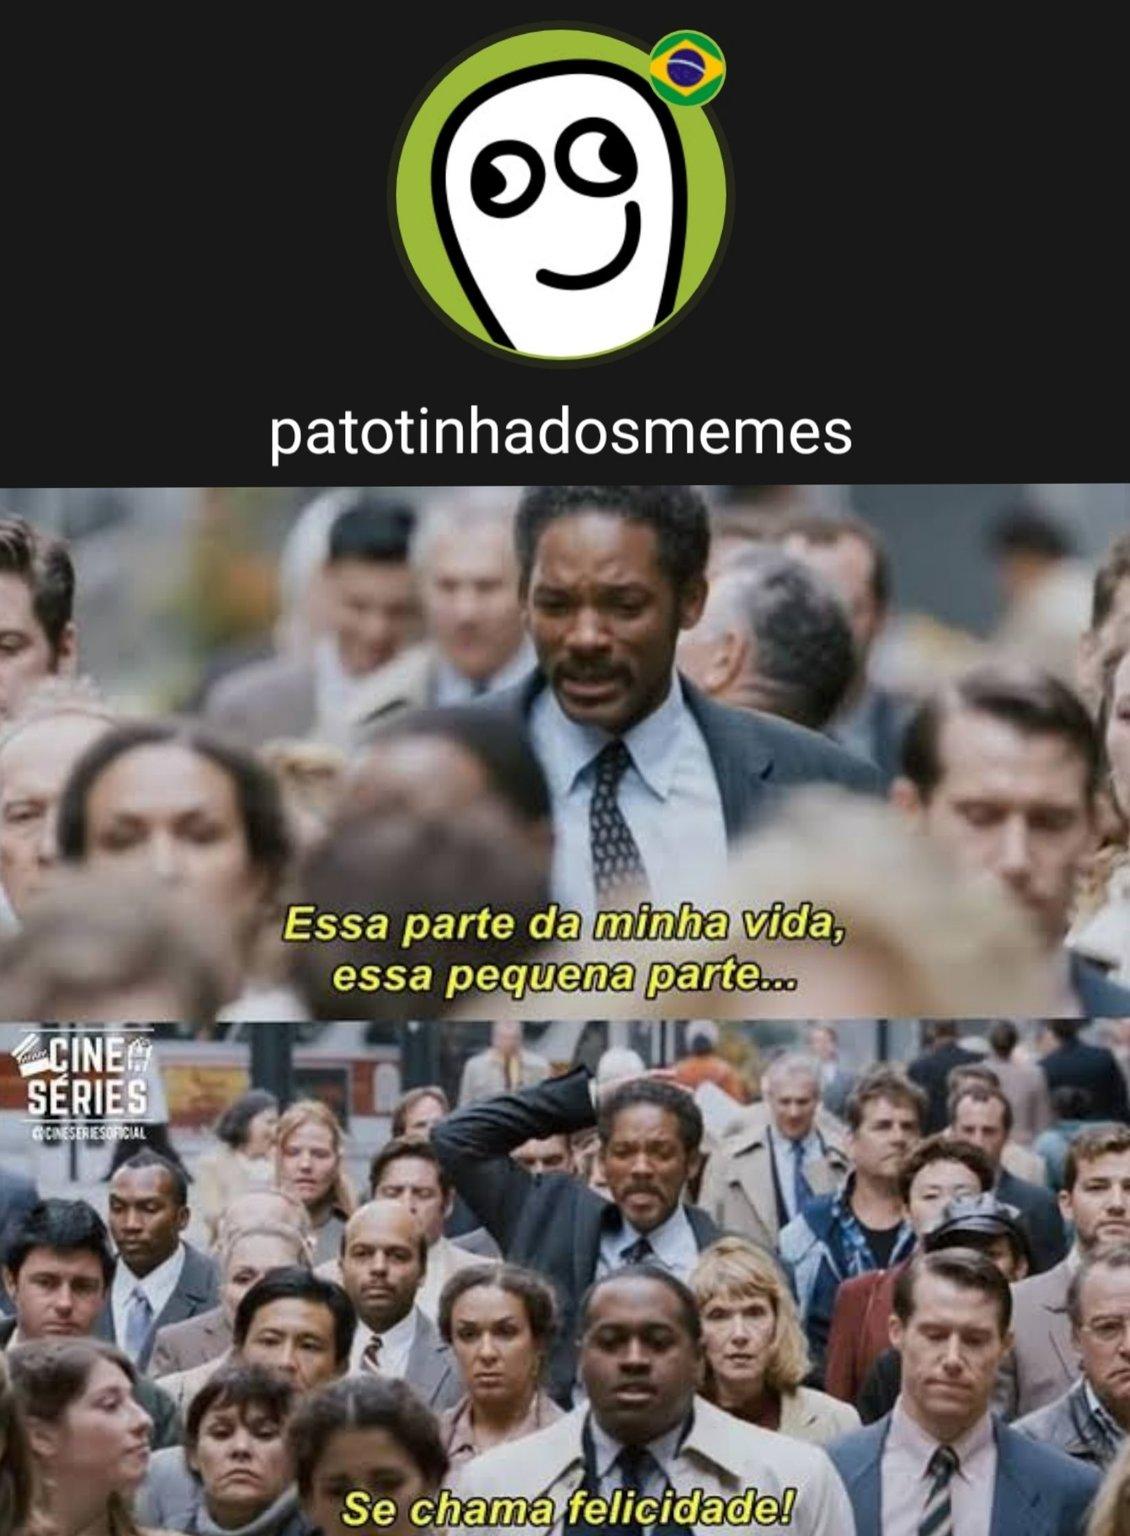 User mais amado foi banido - meme